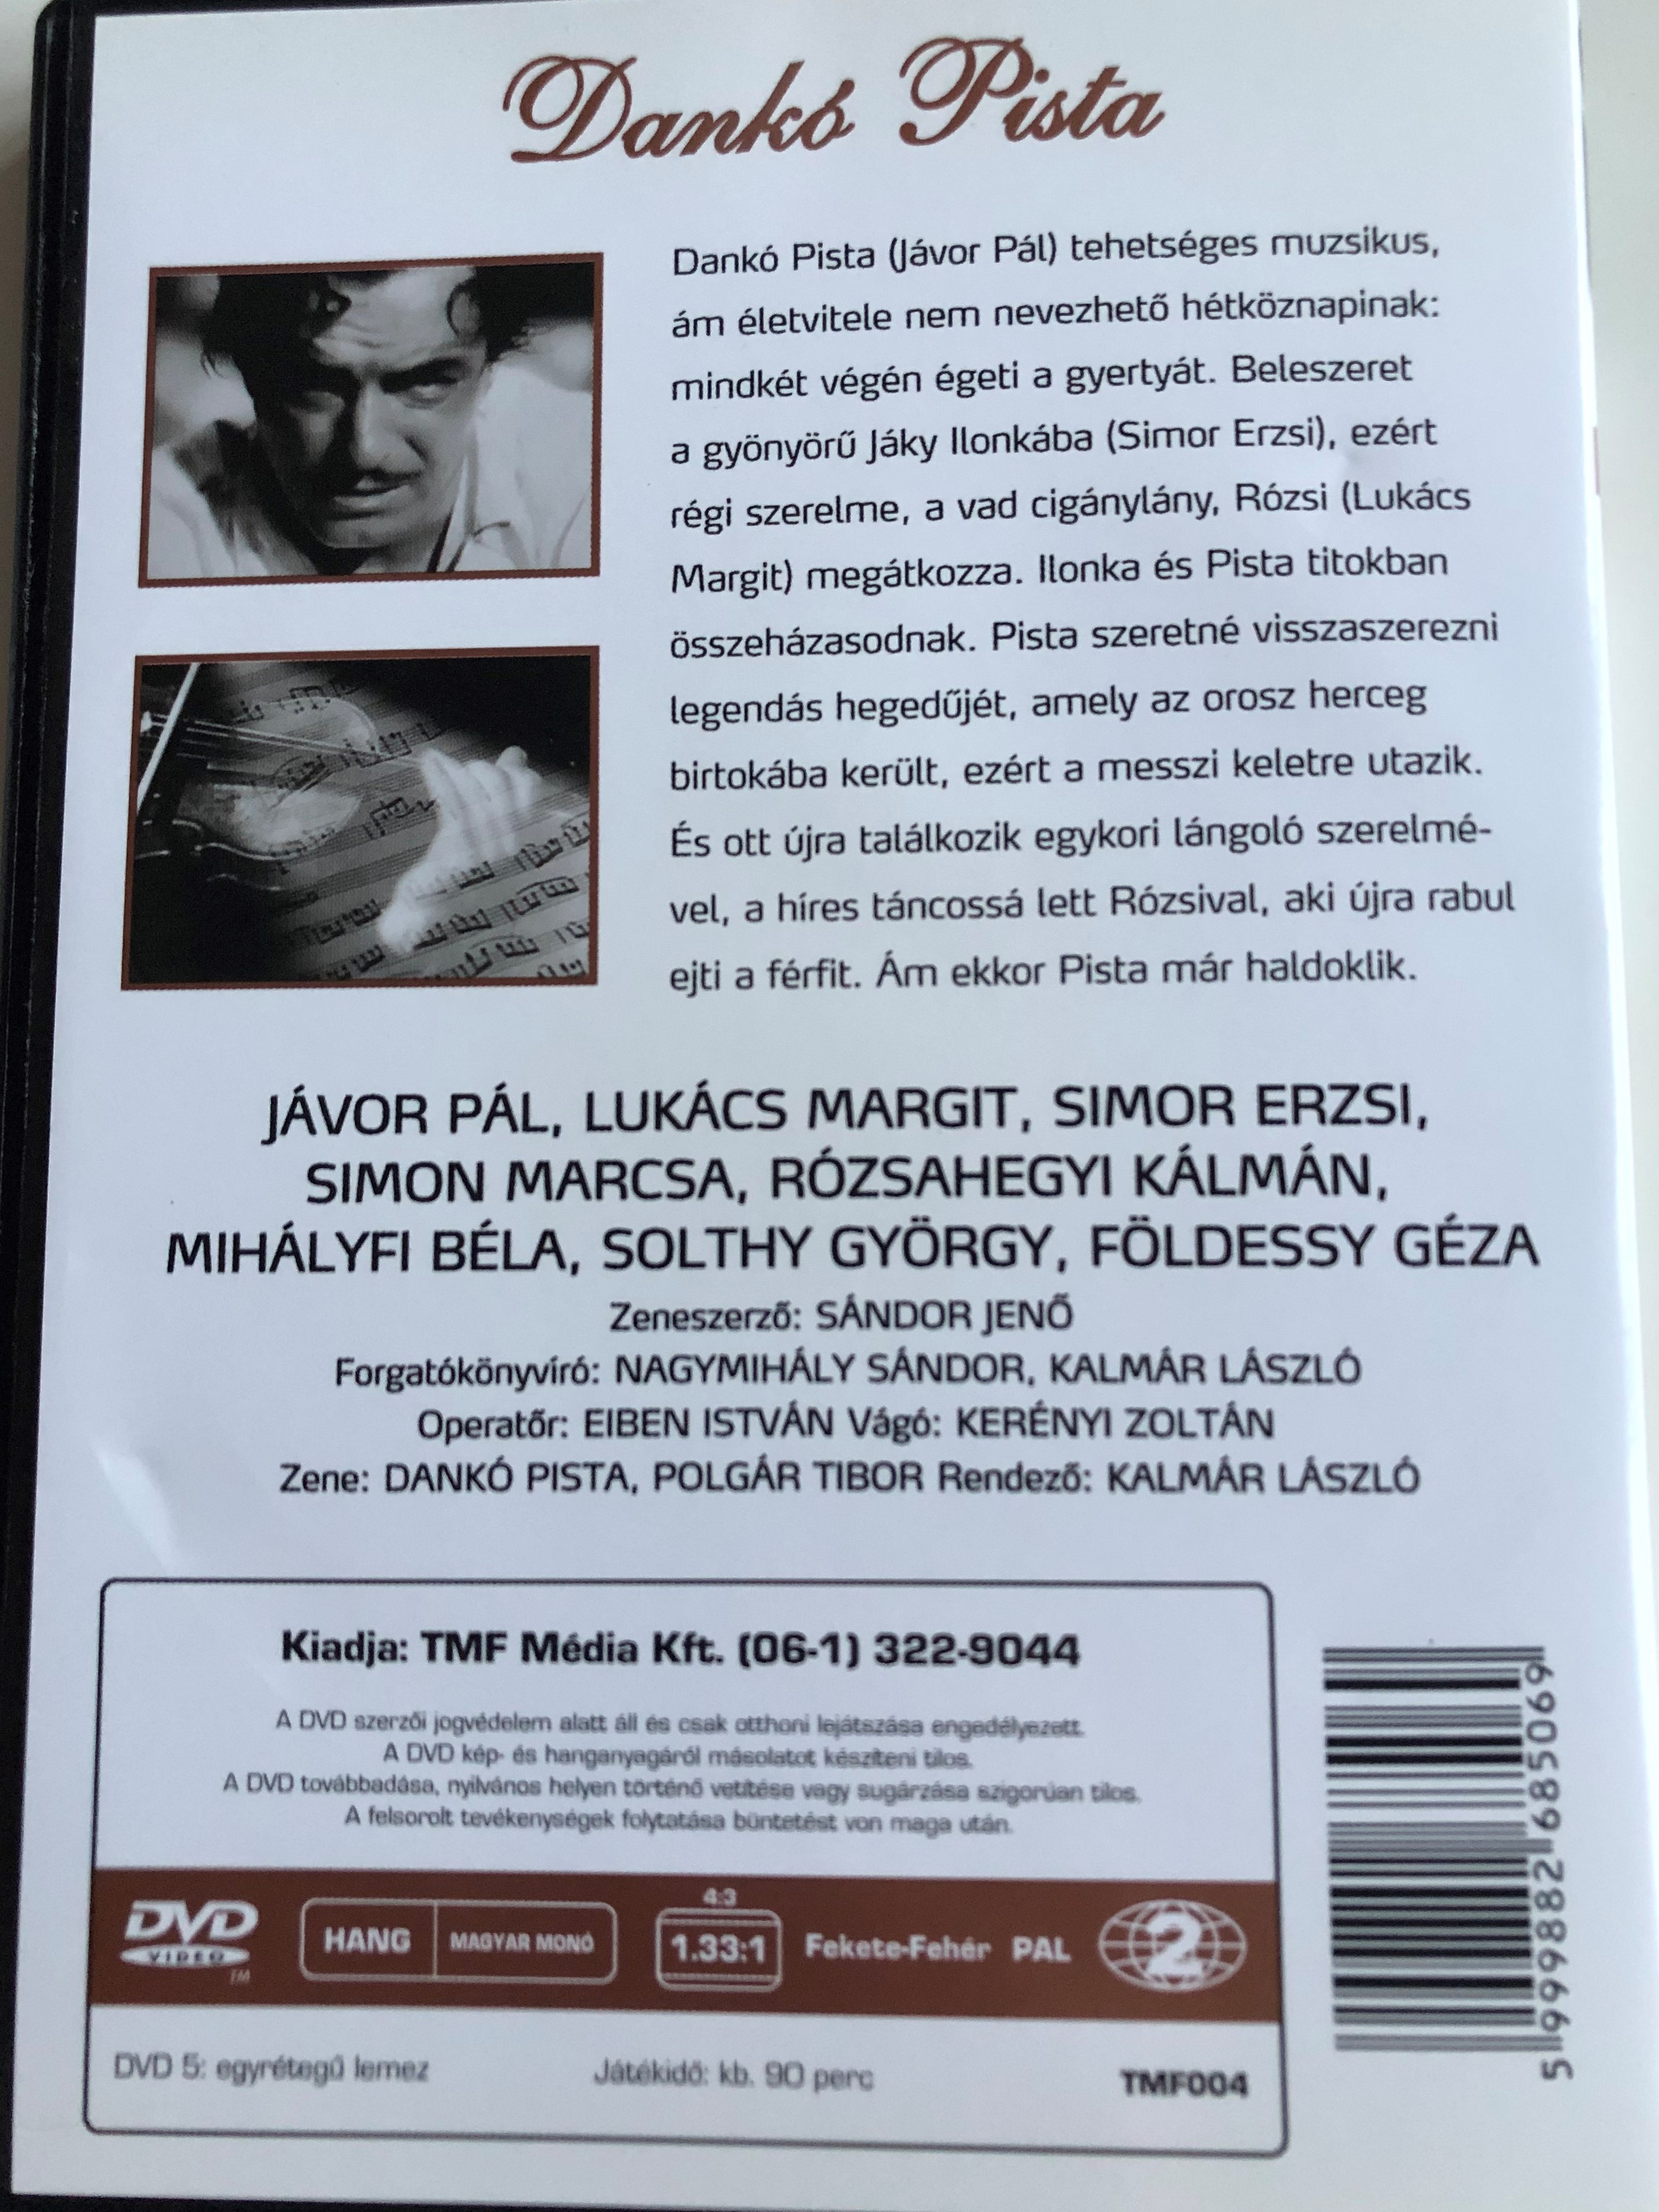 dank-pista-dvd-1940-directed-by-kalm-r-l-szl-2.jpg